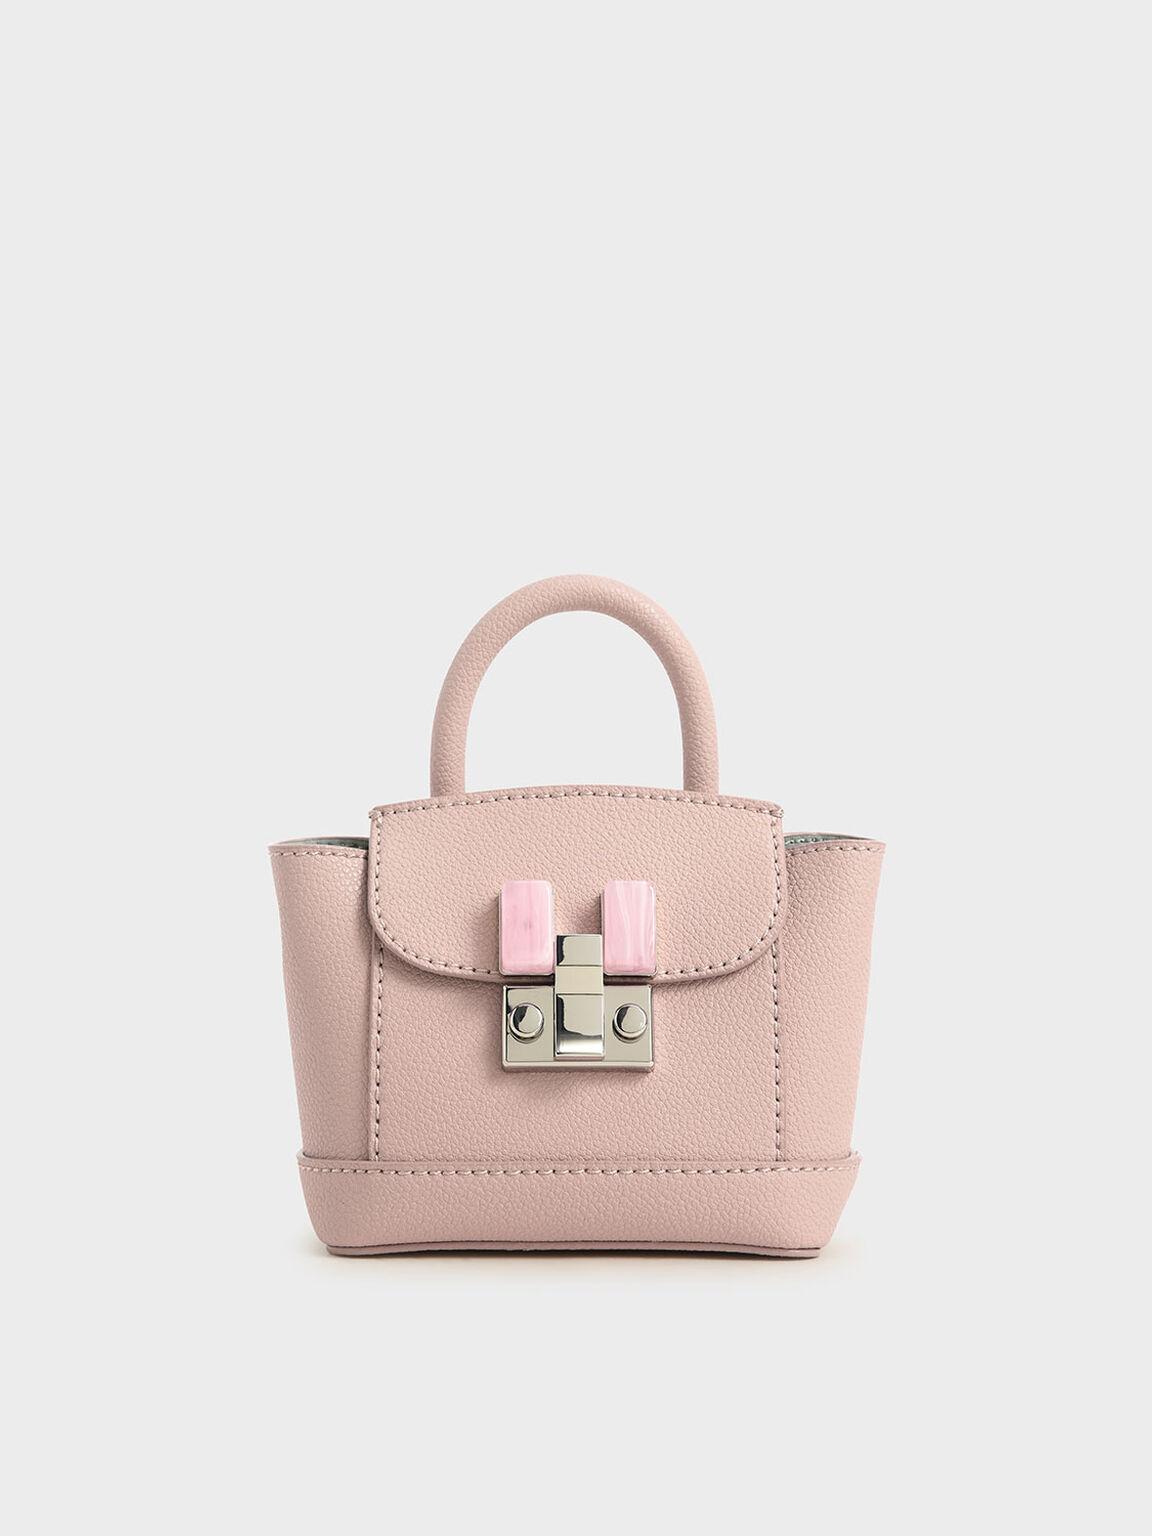 Stone-Embellished Pouch Bag, Pink, hi-res